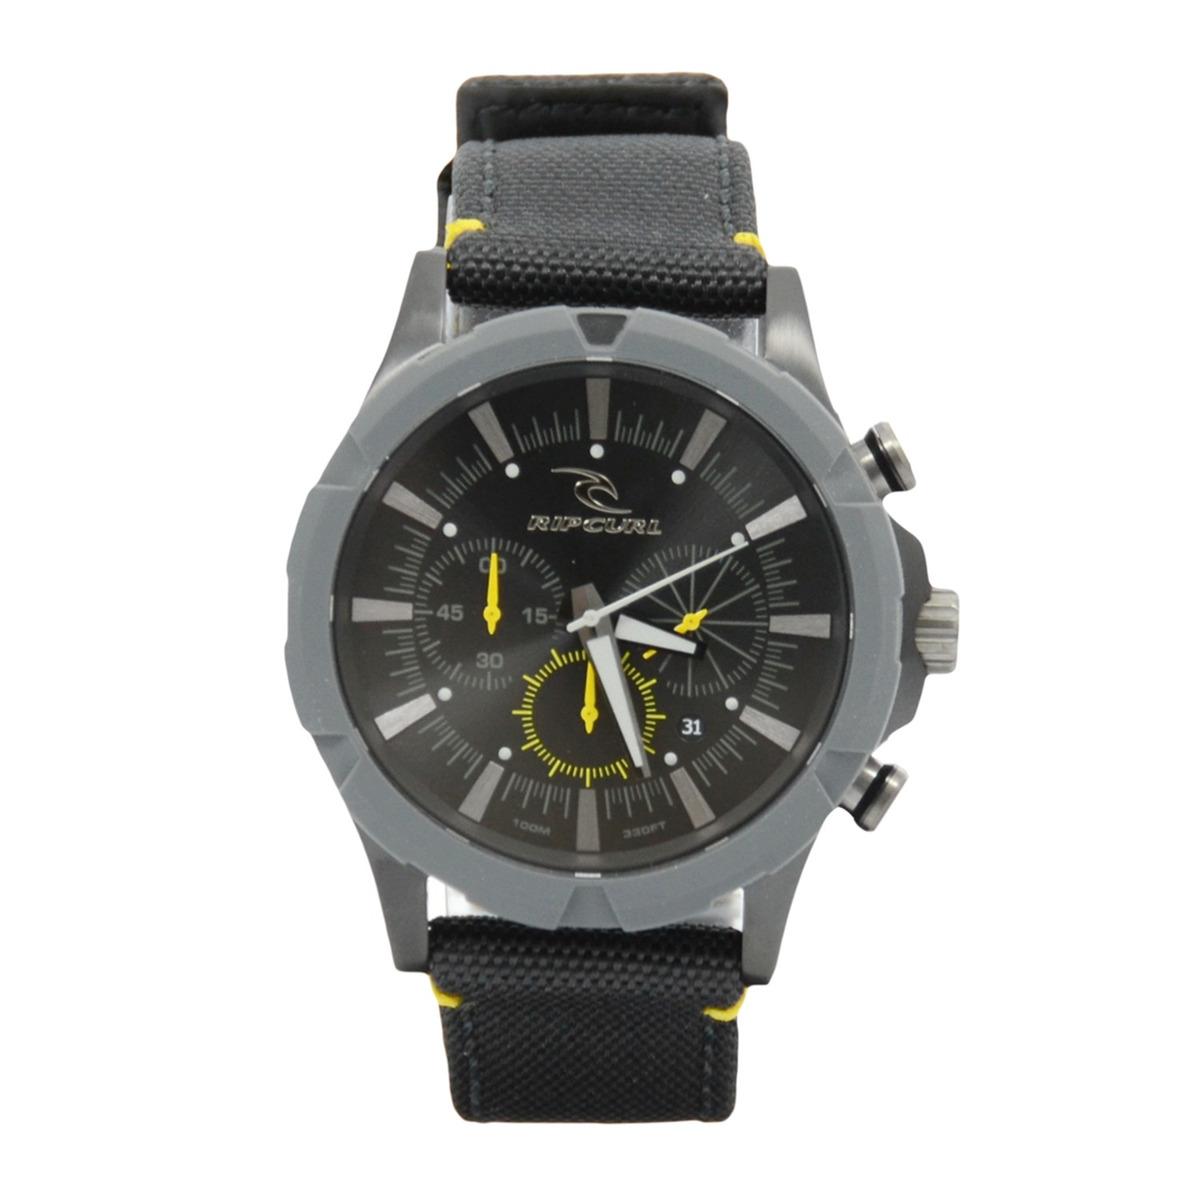 d8cd2904d71 Relógio Rip Curl Maverick Chrono Ballistic Cinza - R  1.399